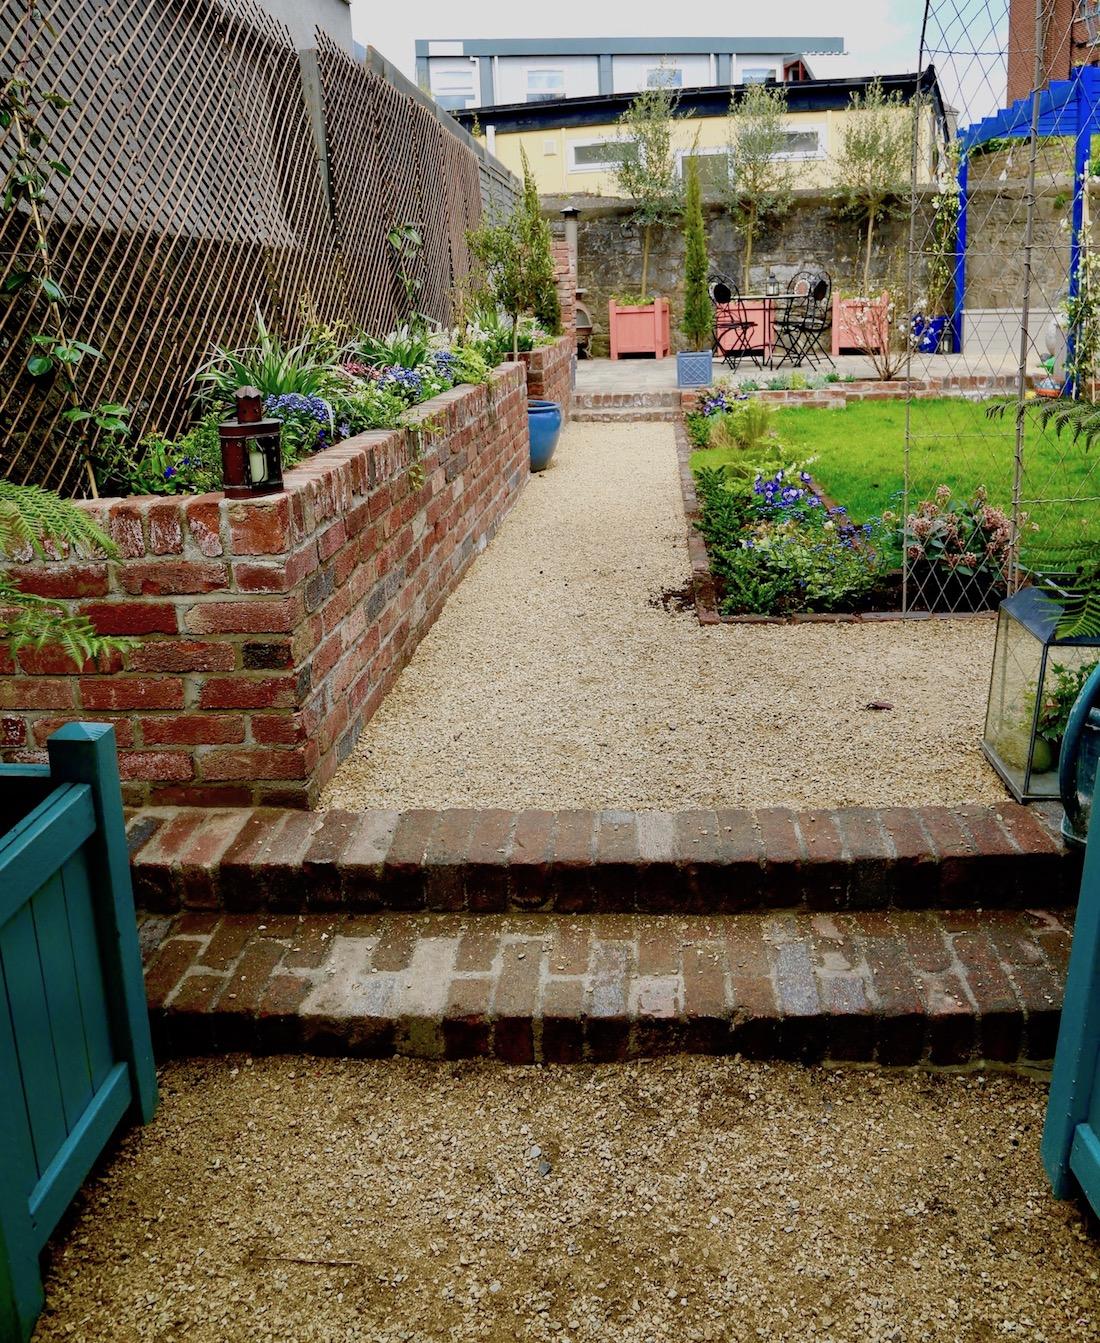 super-alex-alexandra-hollingsworth-garden-design-7.jpg